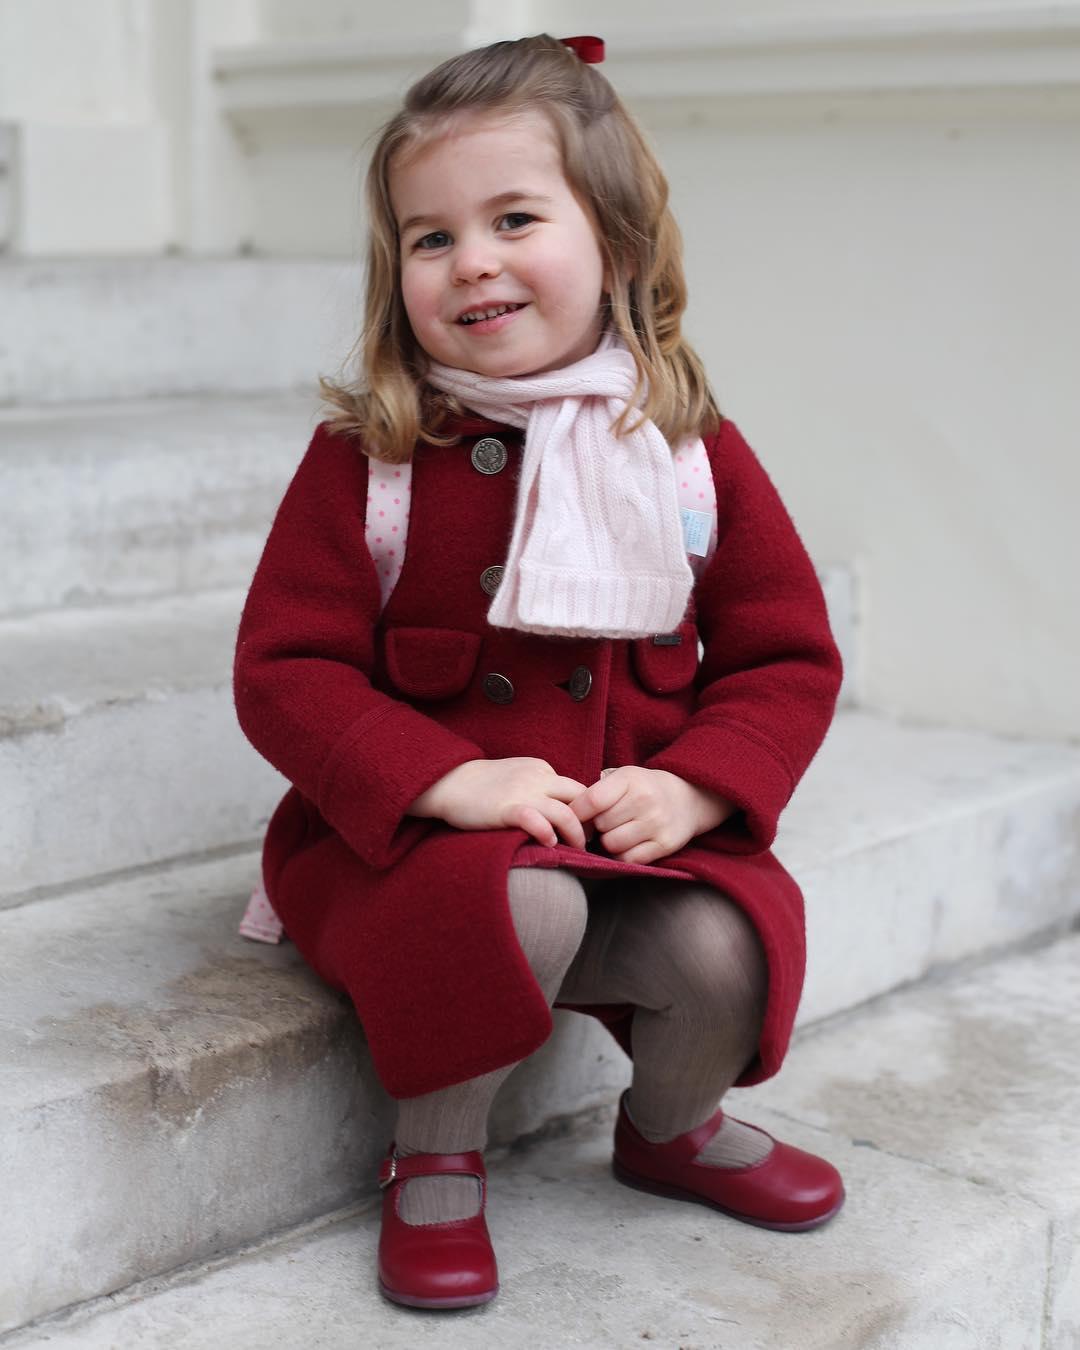 princesa-charlotte-na-escola